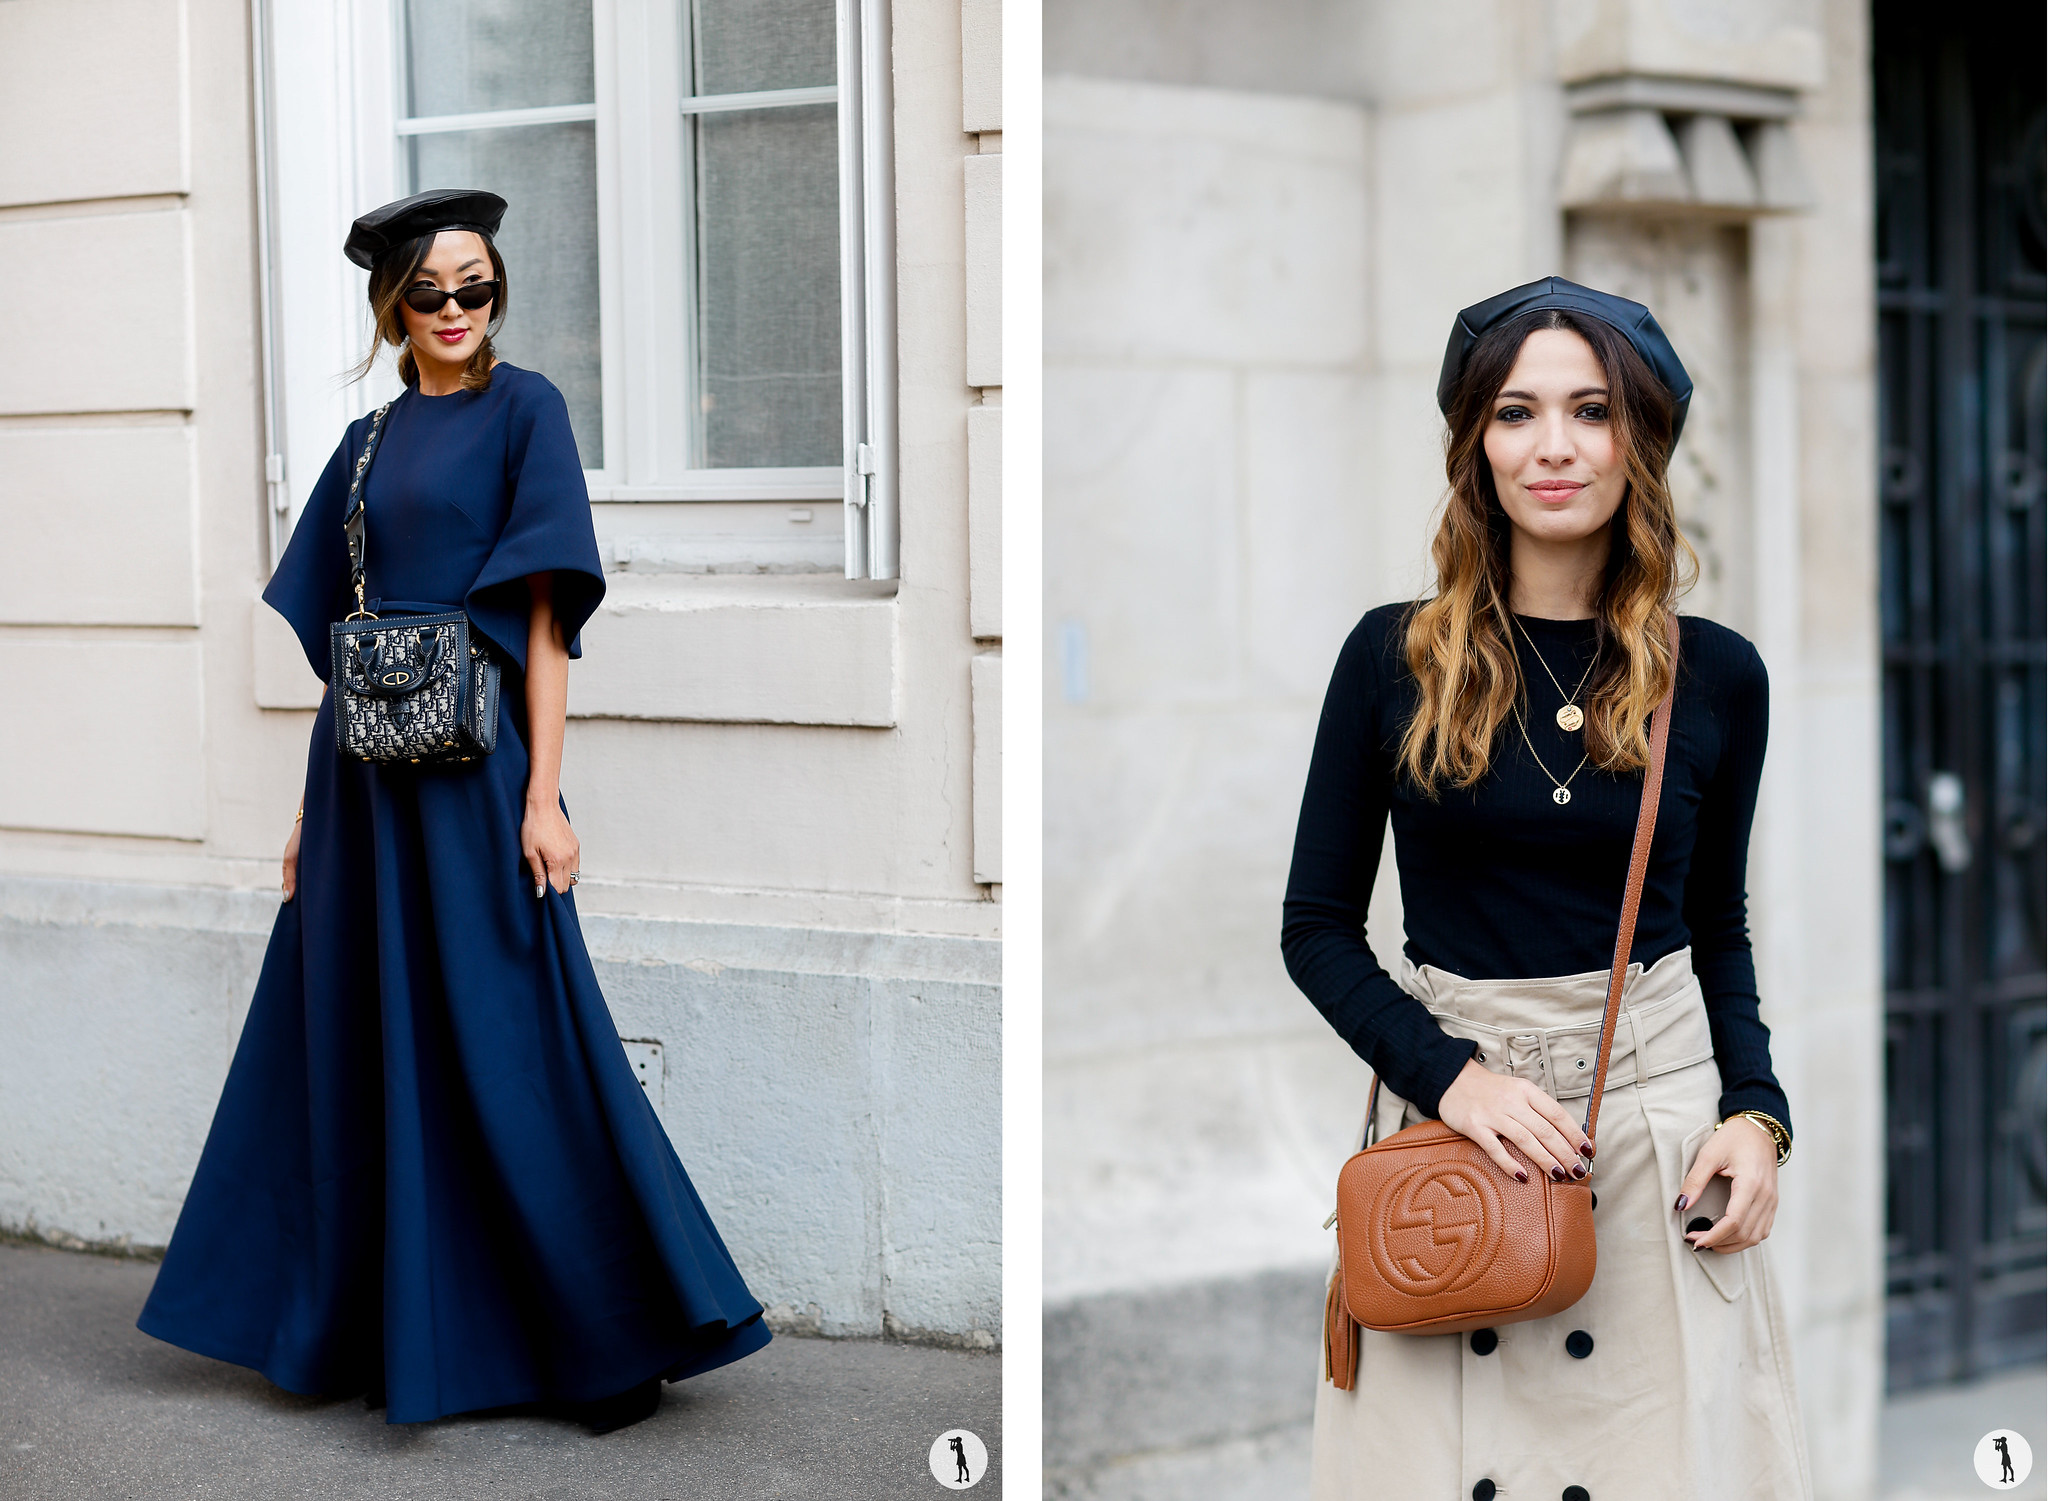 Chriselle Lim and Sofya Benzakour - Paris Fashion Week SS18